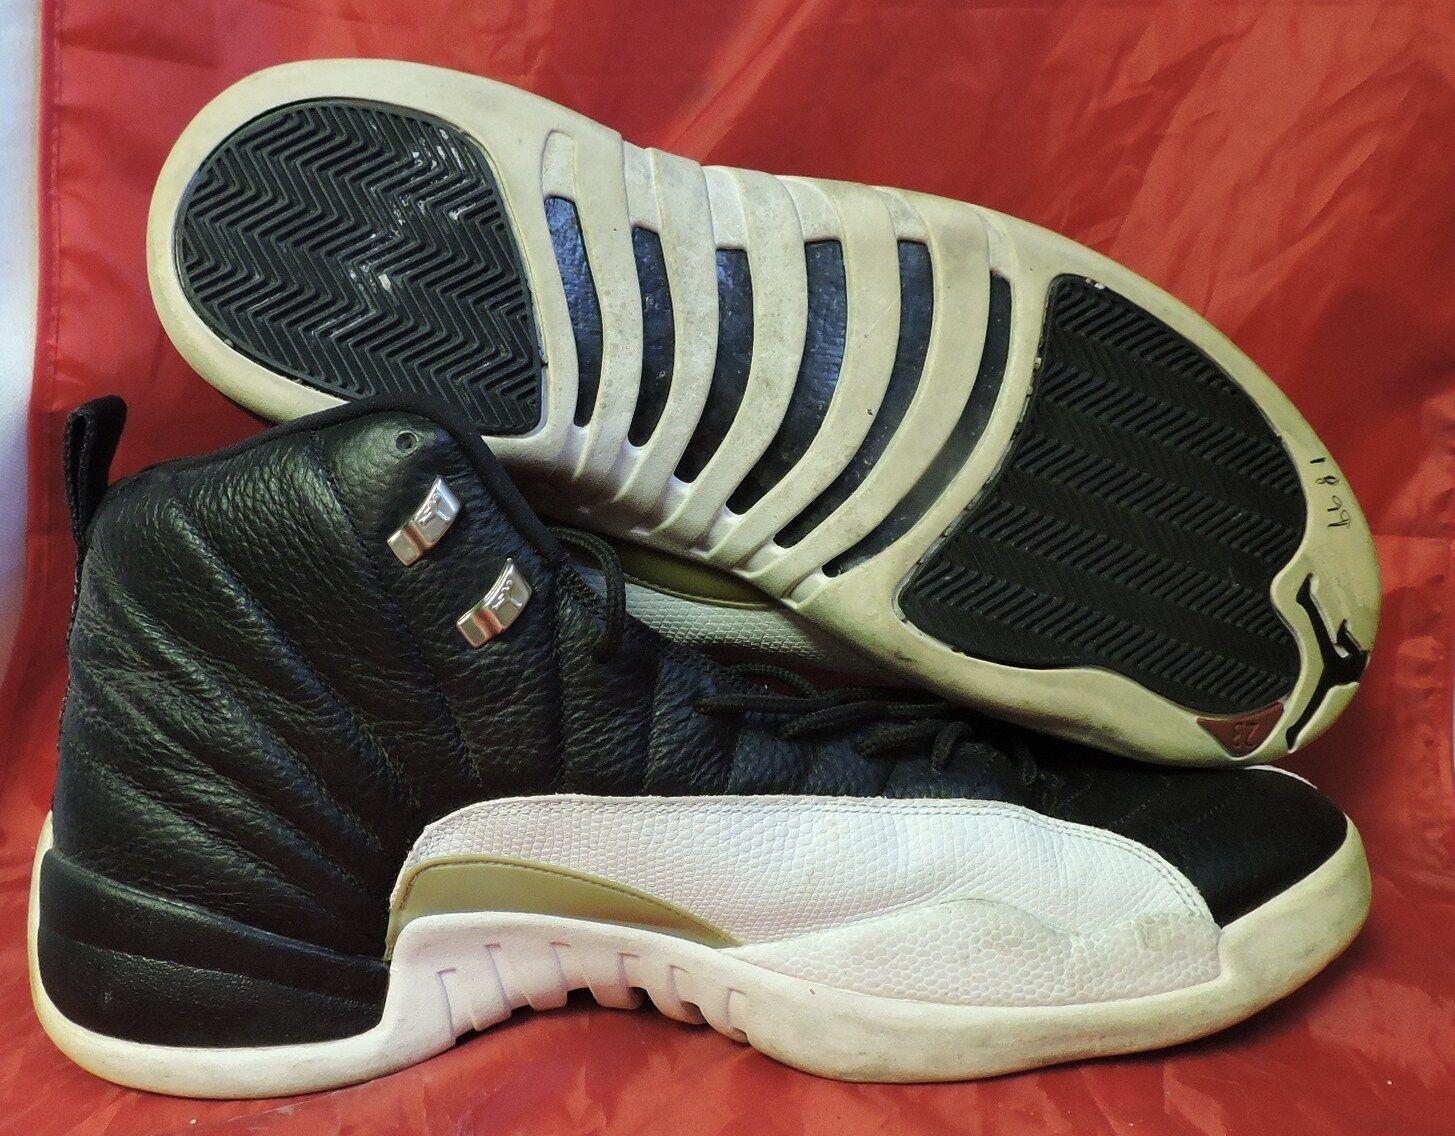 2004 Nike Air Jordan XII 12 Retro PLAYOFF BLACK WHITE COOL GREY 136001-016 SZ 18